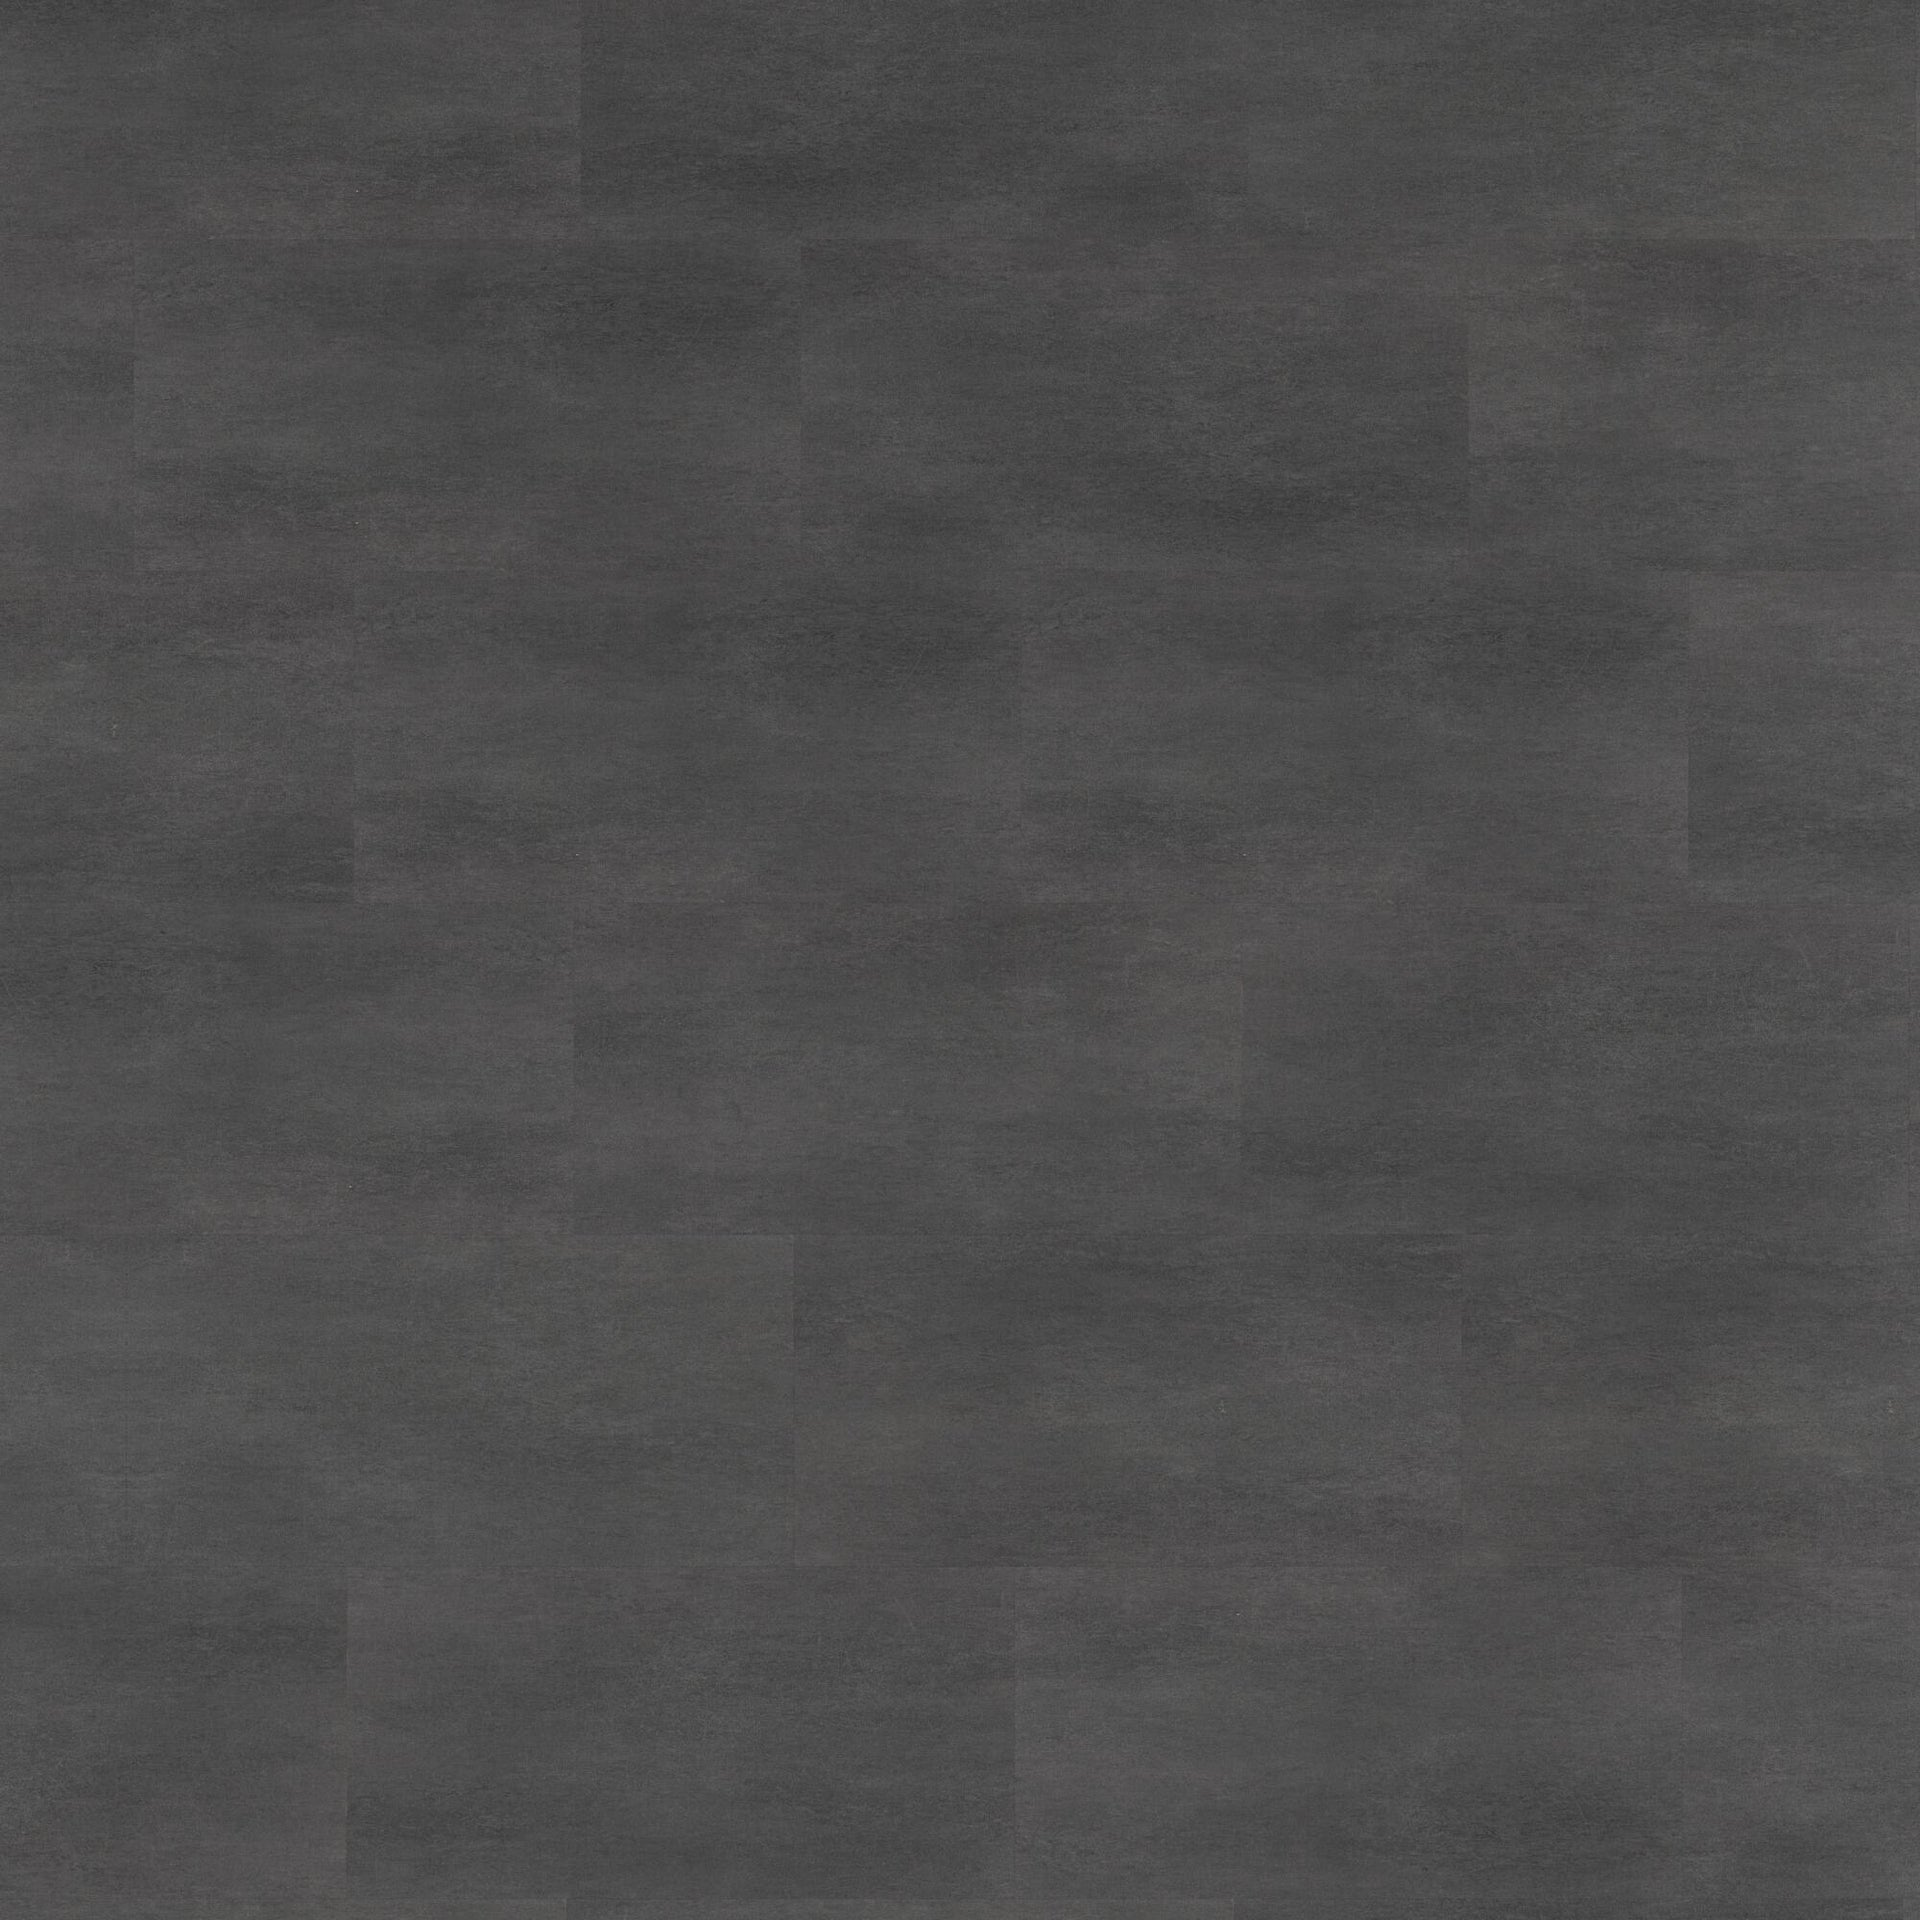 Pavimento PVC flottante clic+ Art For New Sp 4.2 mm nero - 9